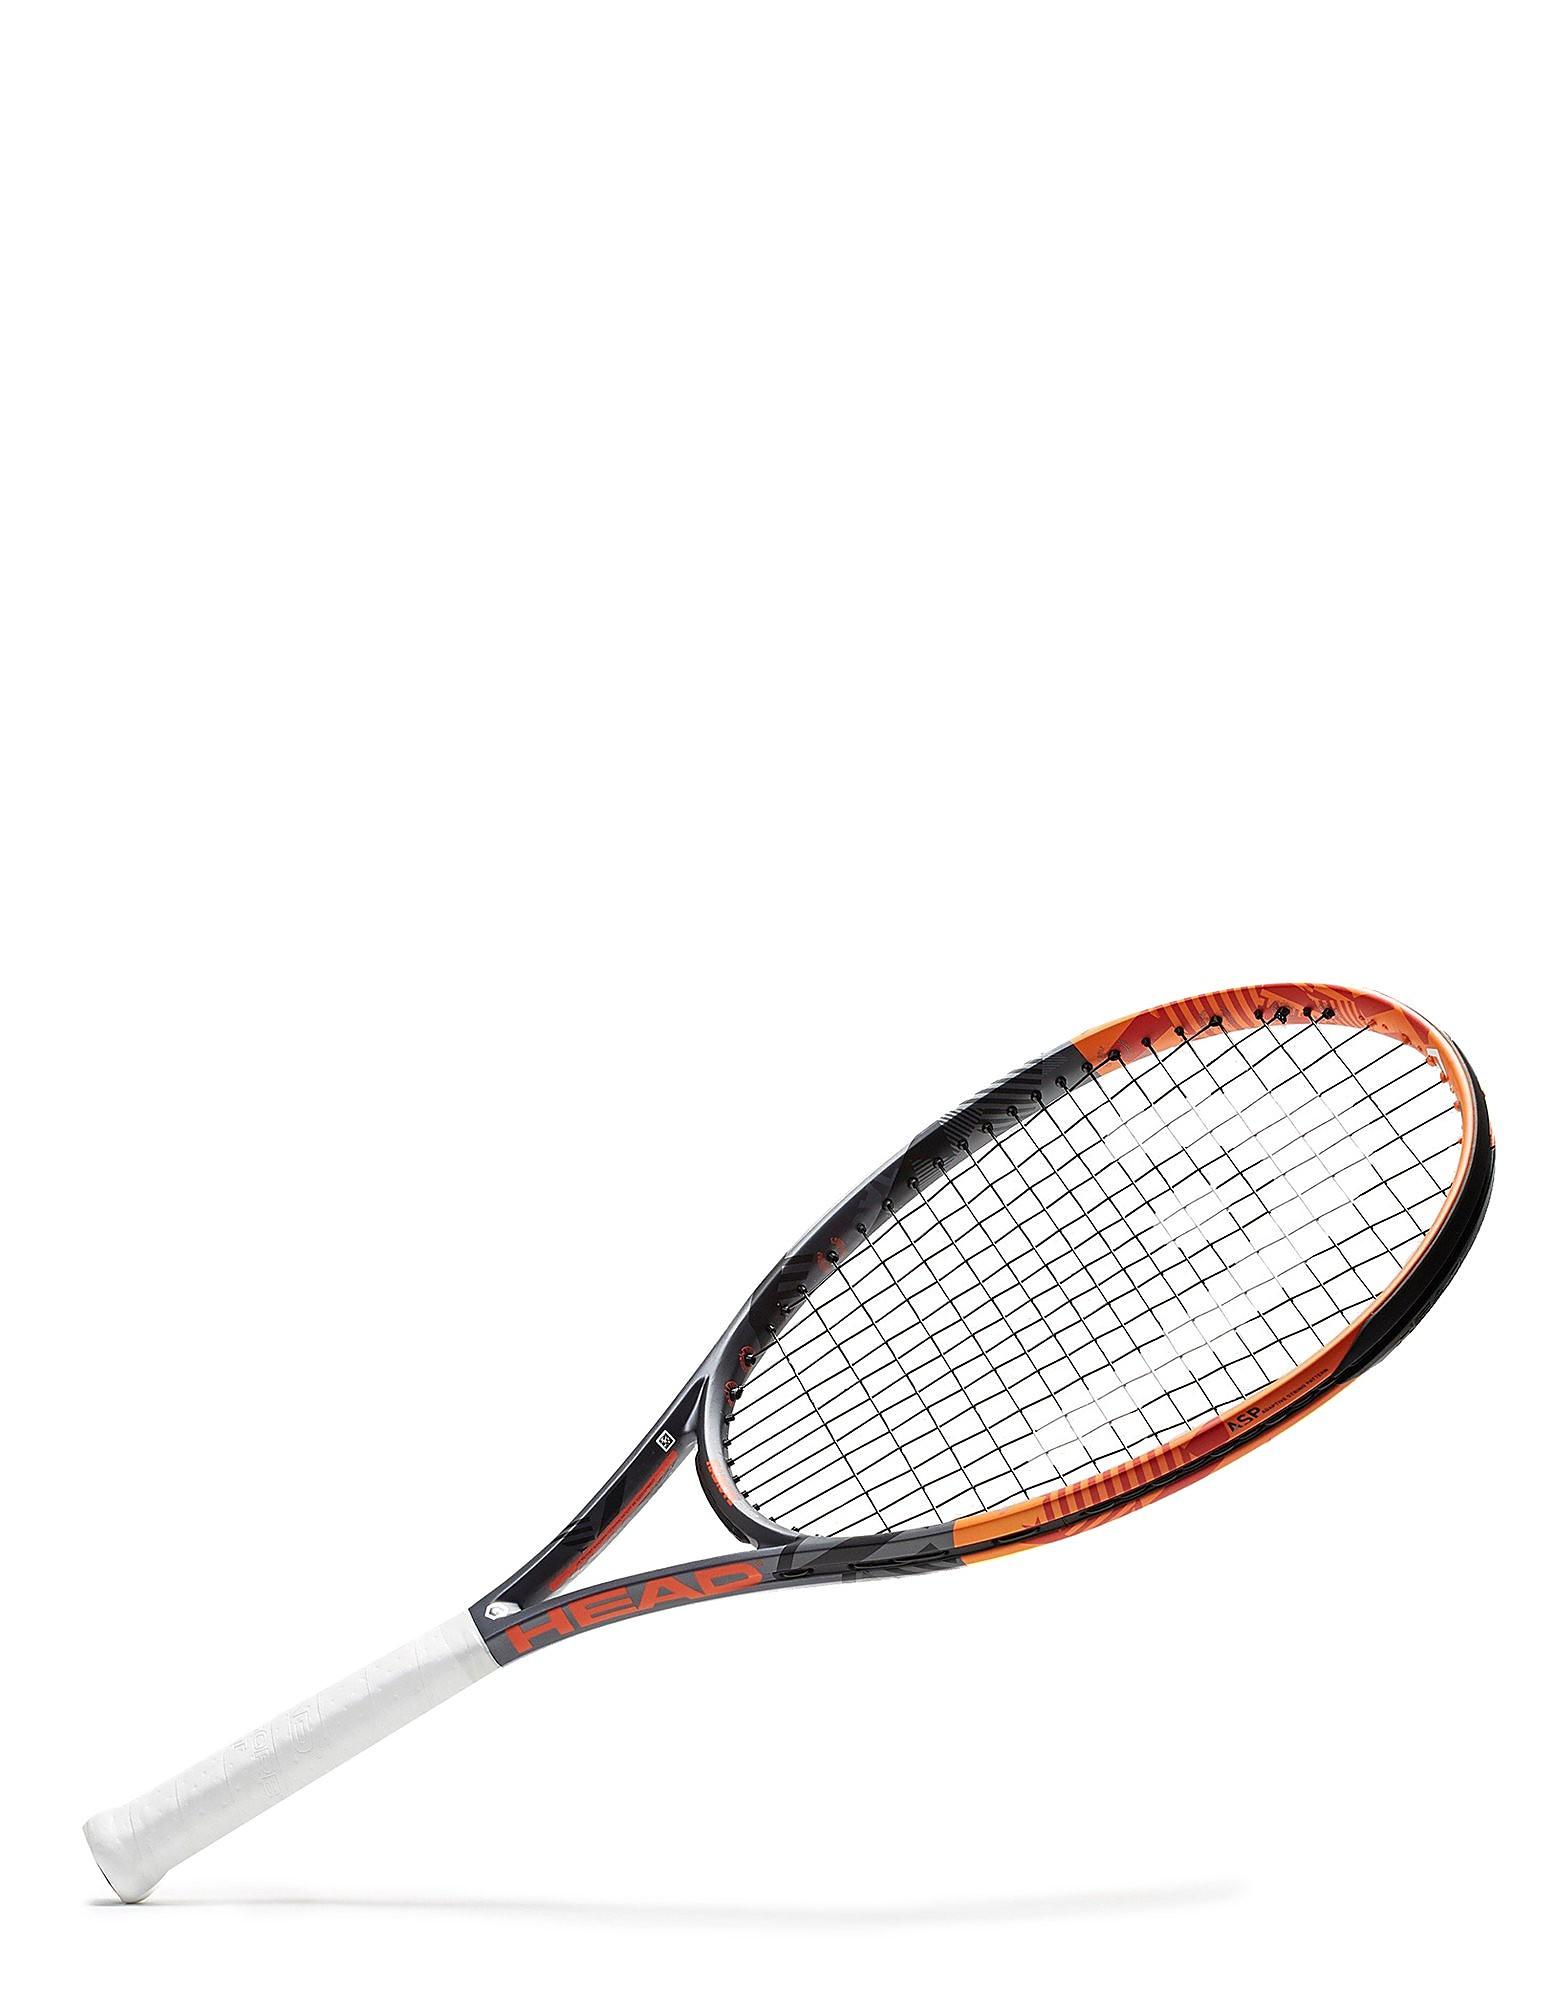 Head Graphene XT Radical Power Tennis Racket